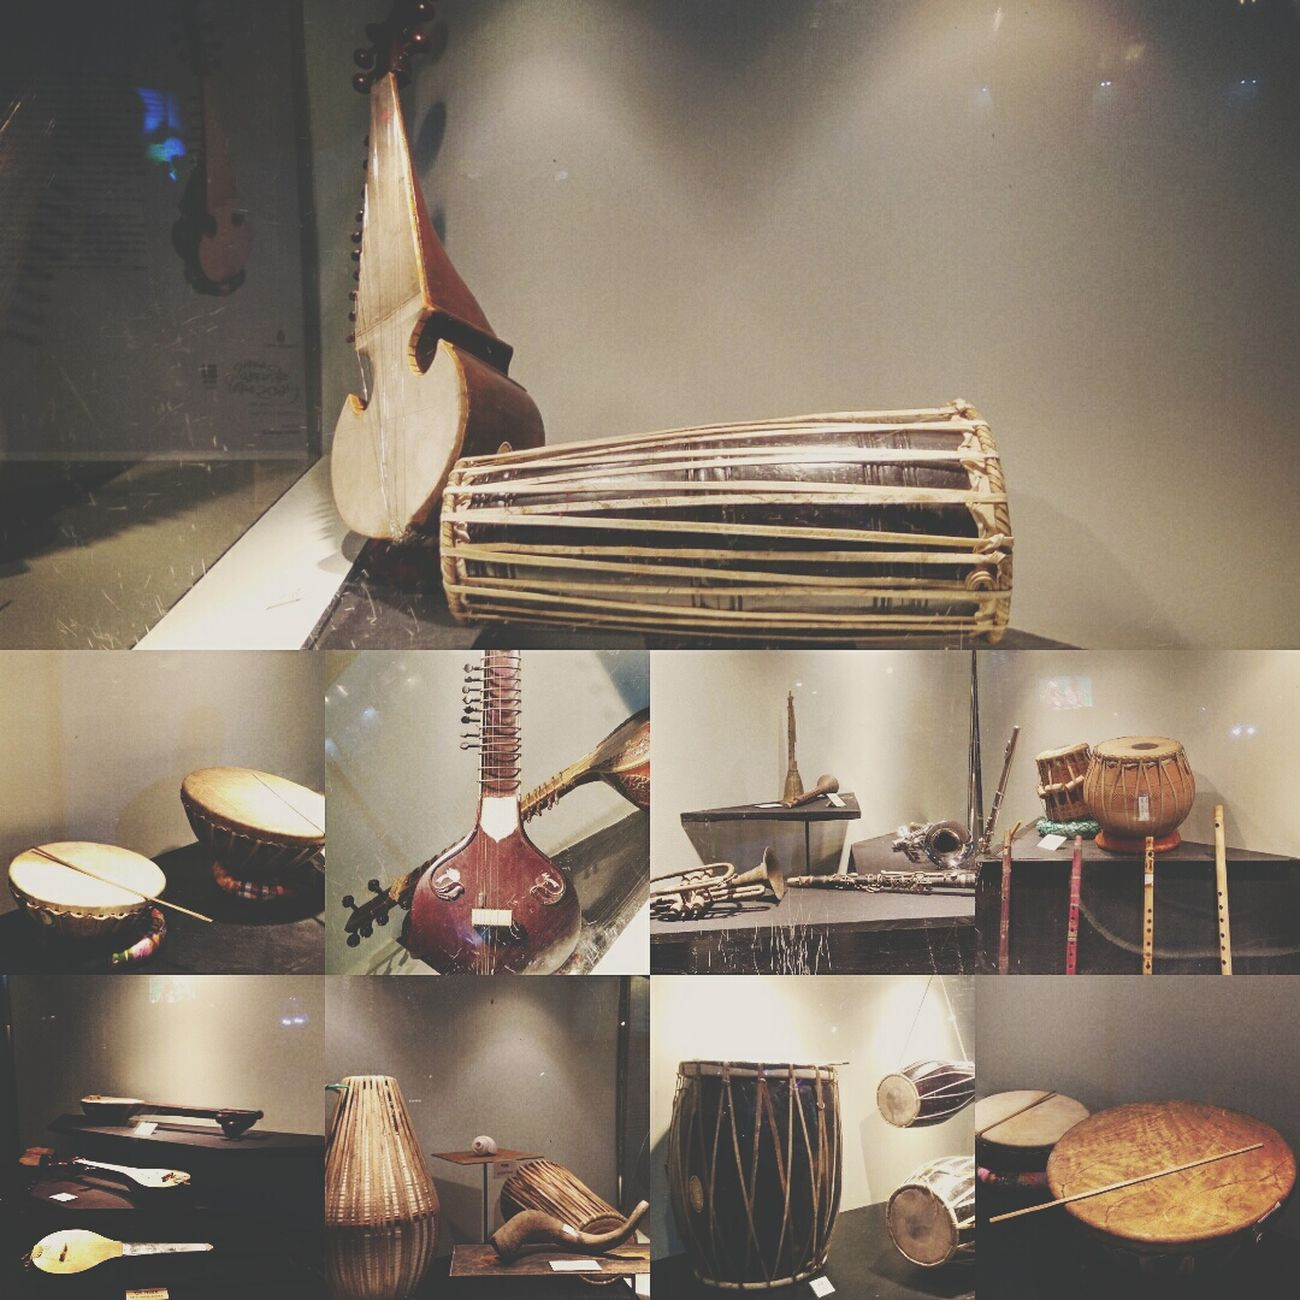 Instruments Instrumentals Classic Classical Music Classical Concert